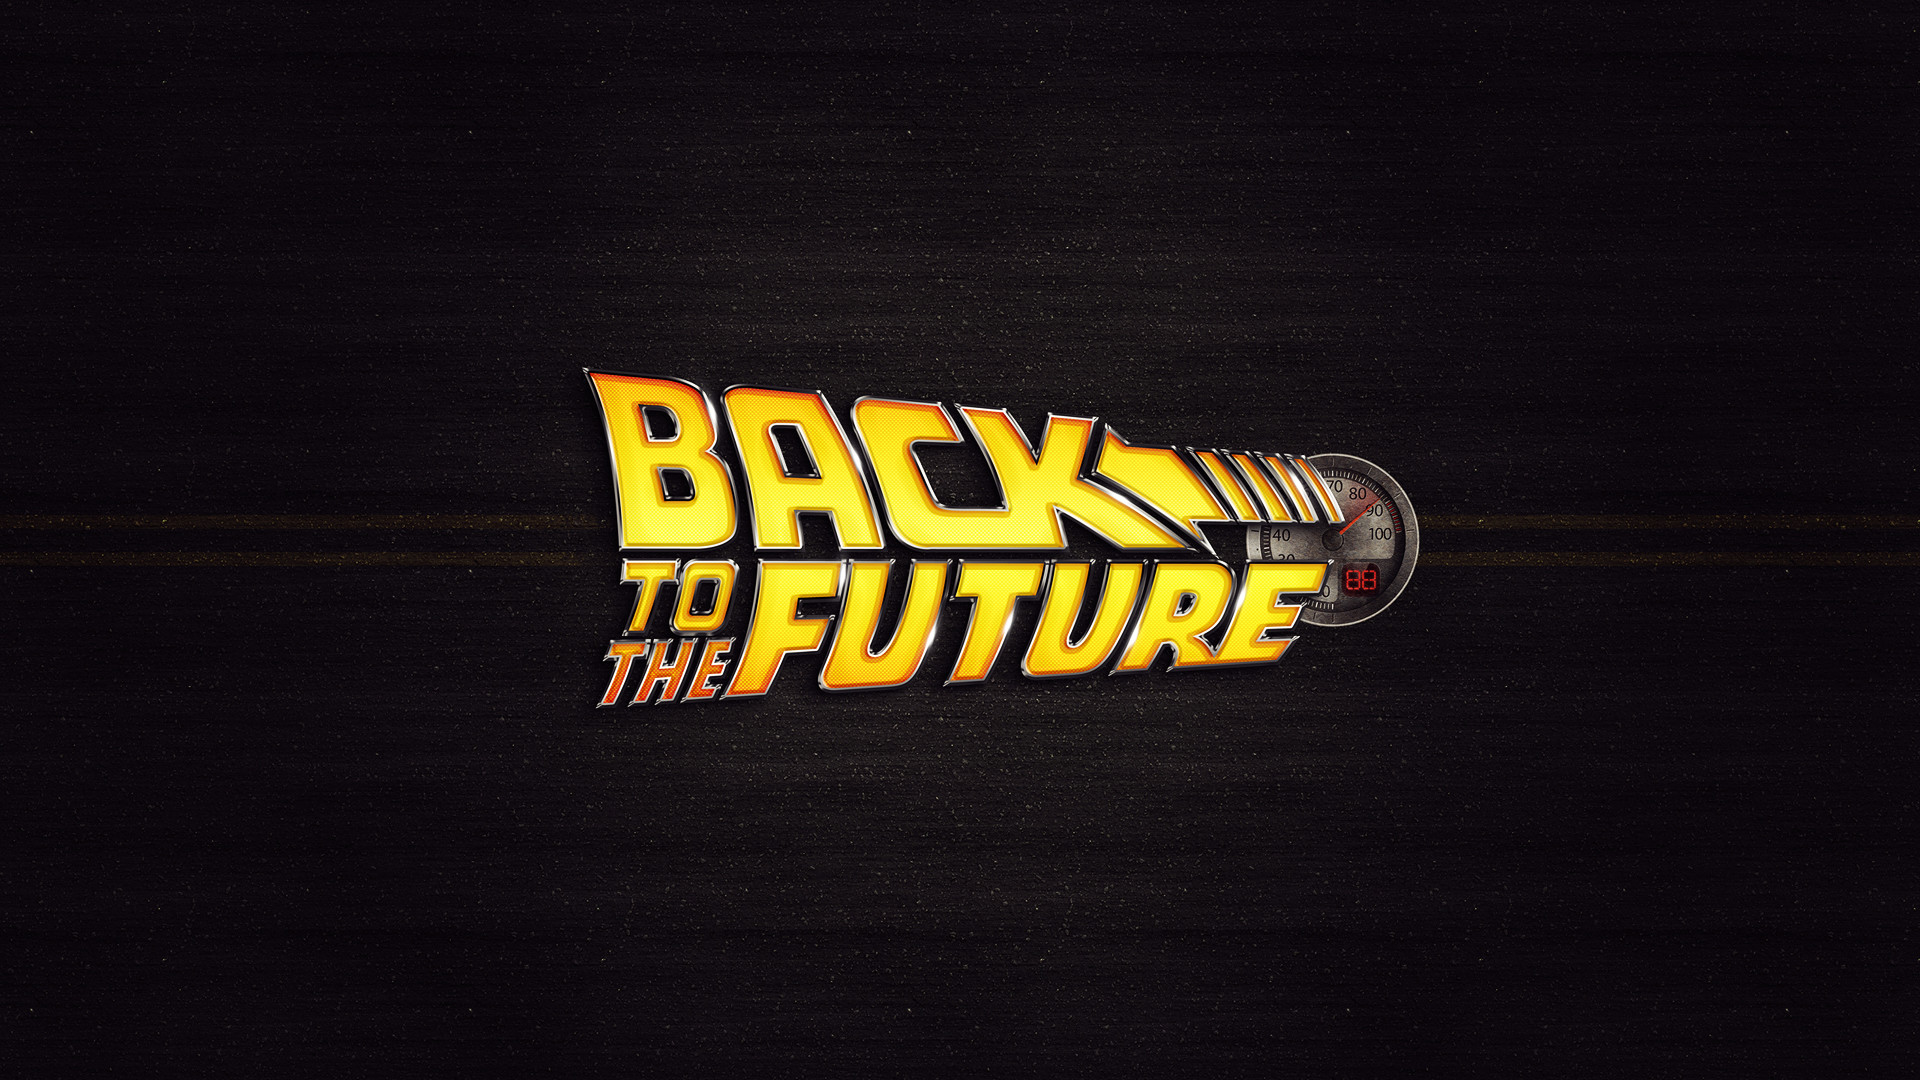 Back To The Future Movie Logo Desktop Wallpaper Uploaded by DesktopWalls